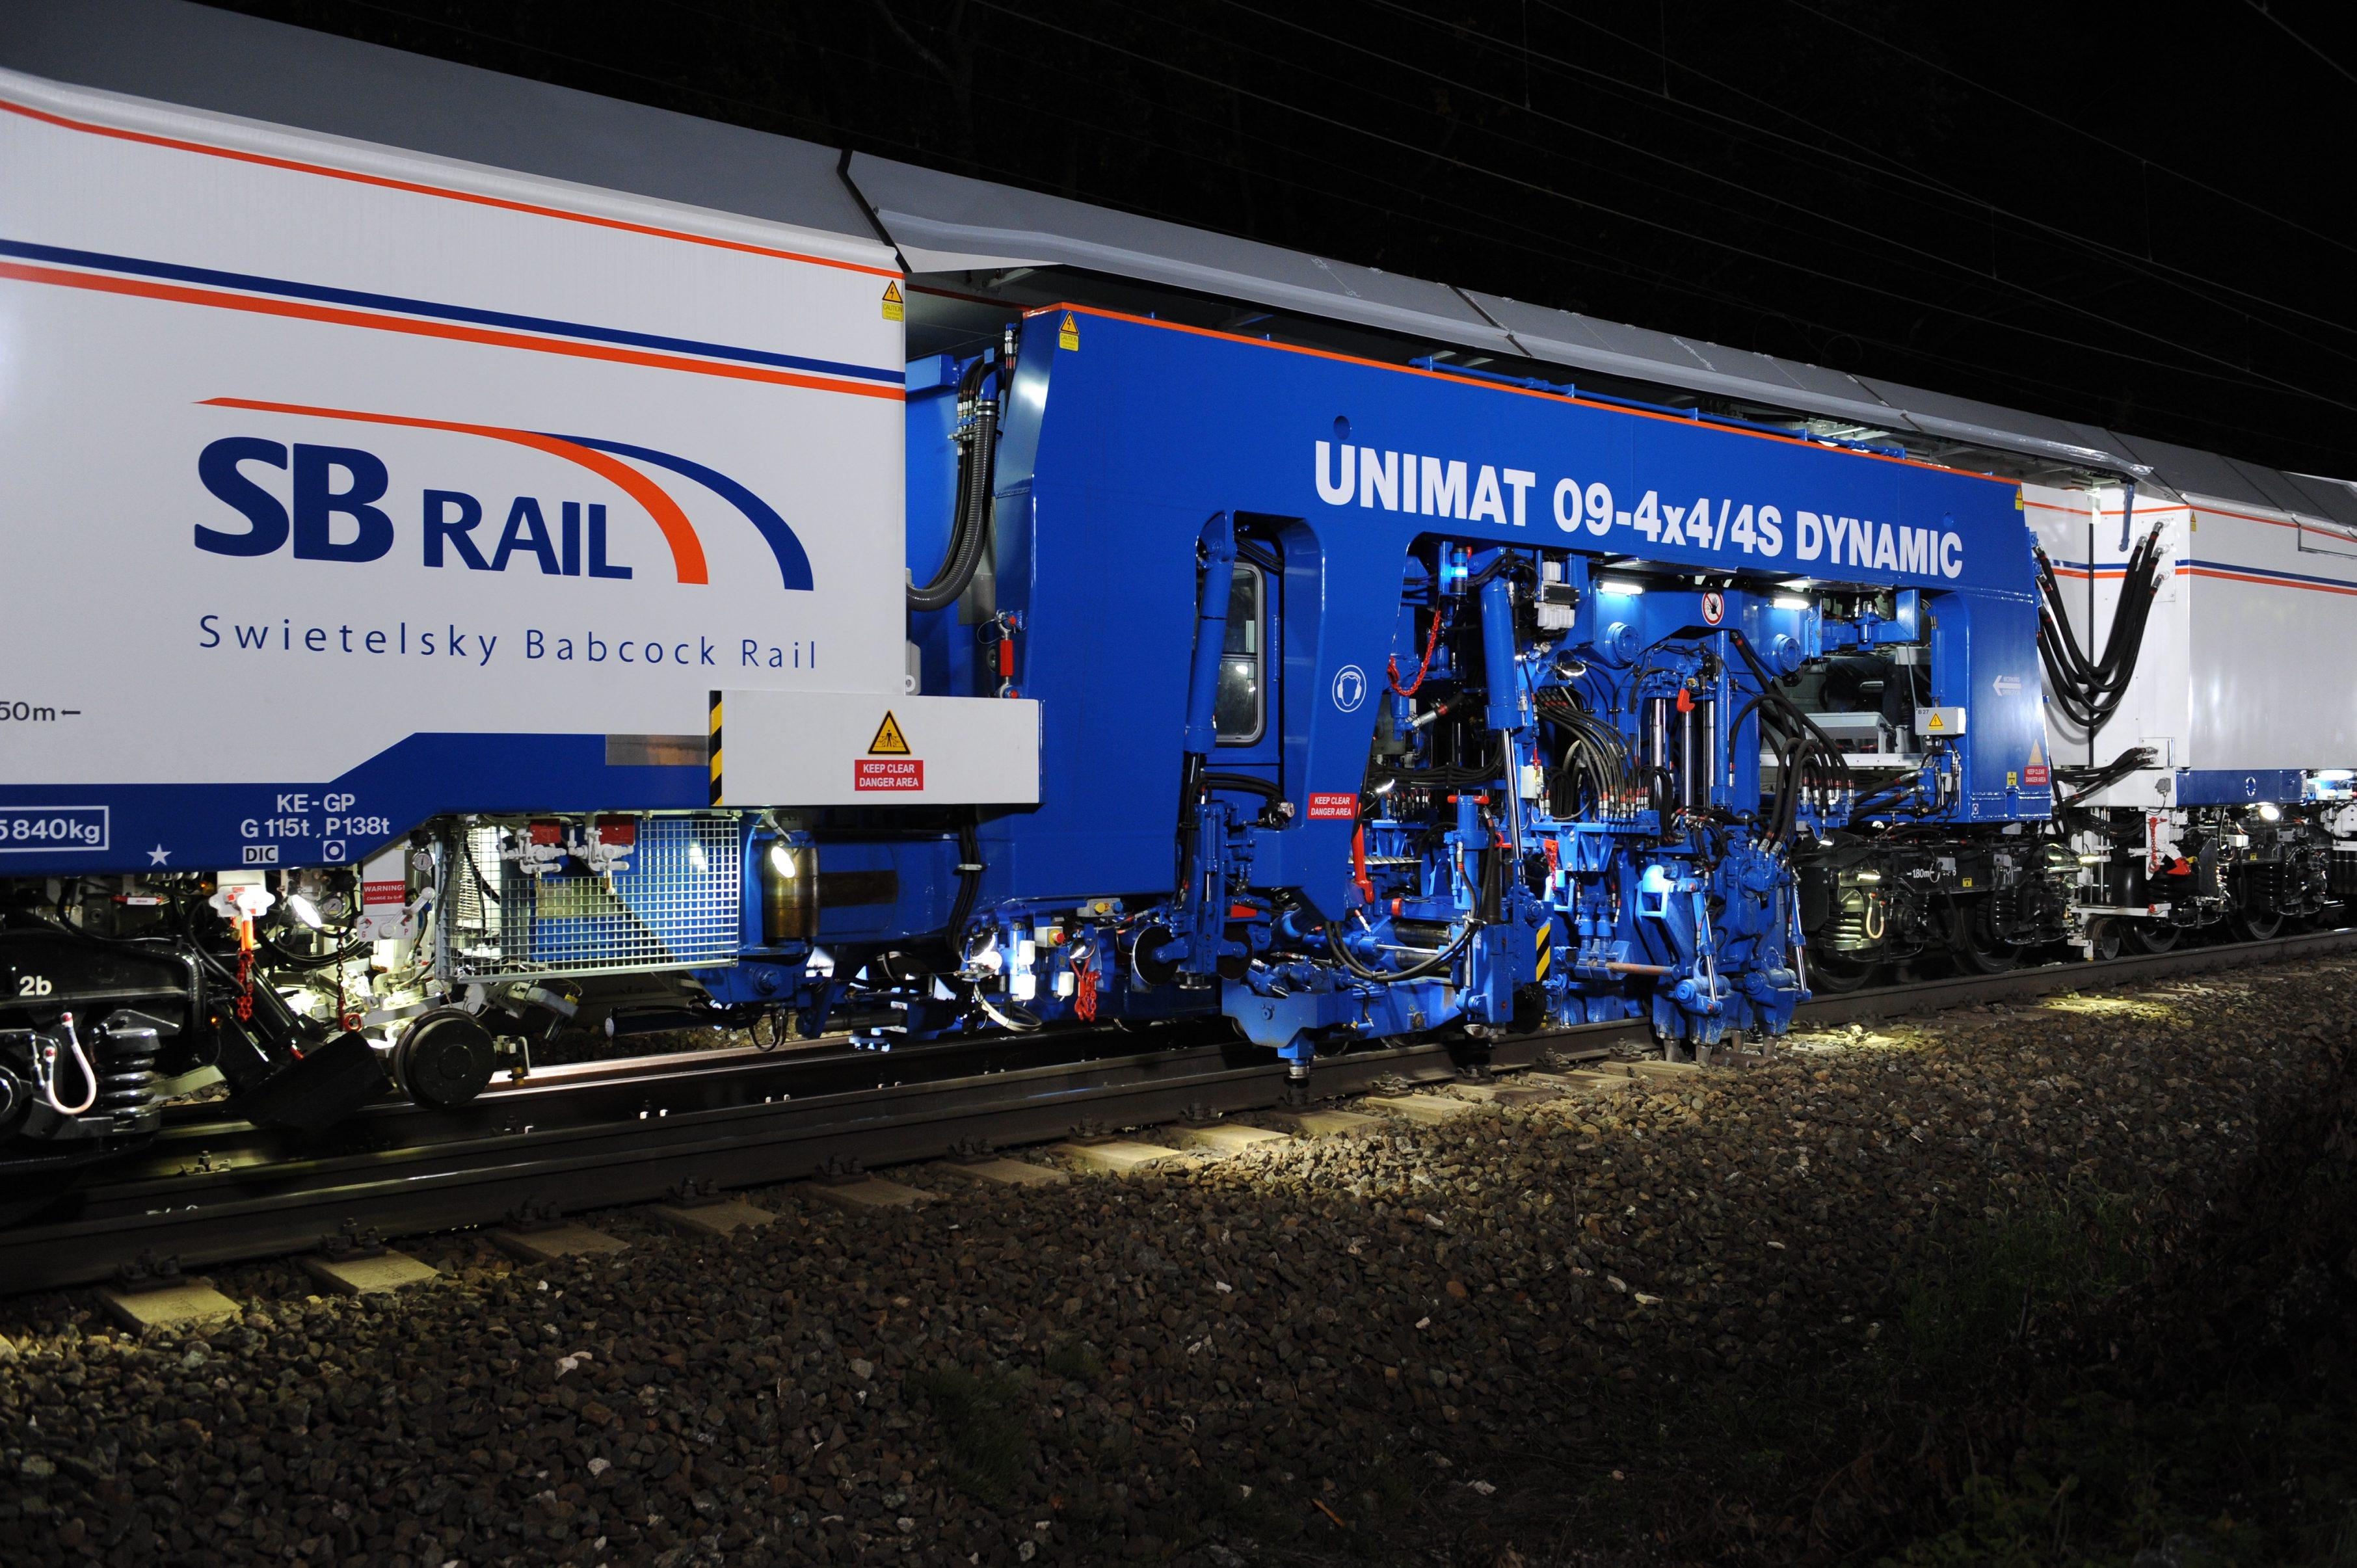 Plasser & Theurer 09-4x4/4S Dynamic - SB Rail Case Studies